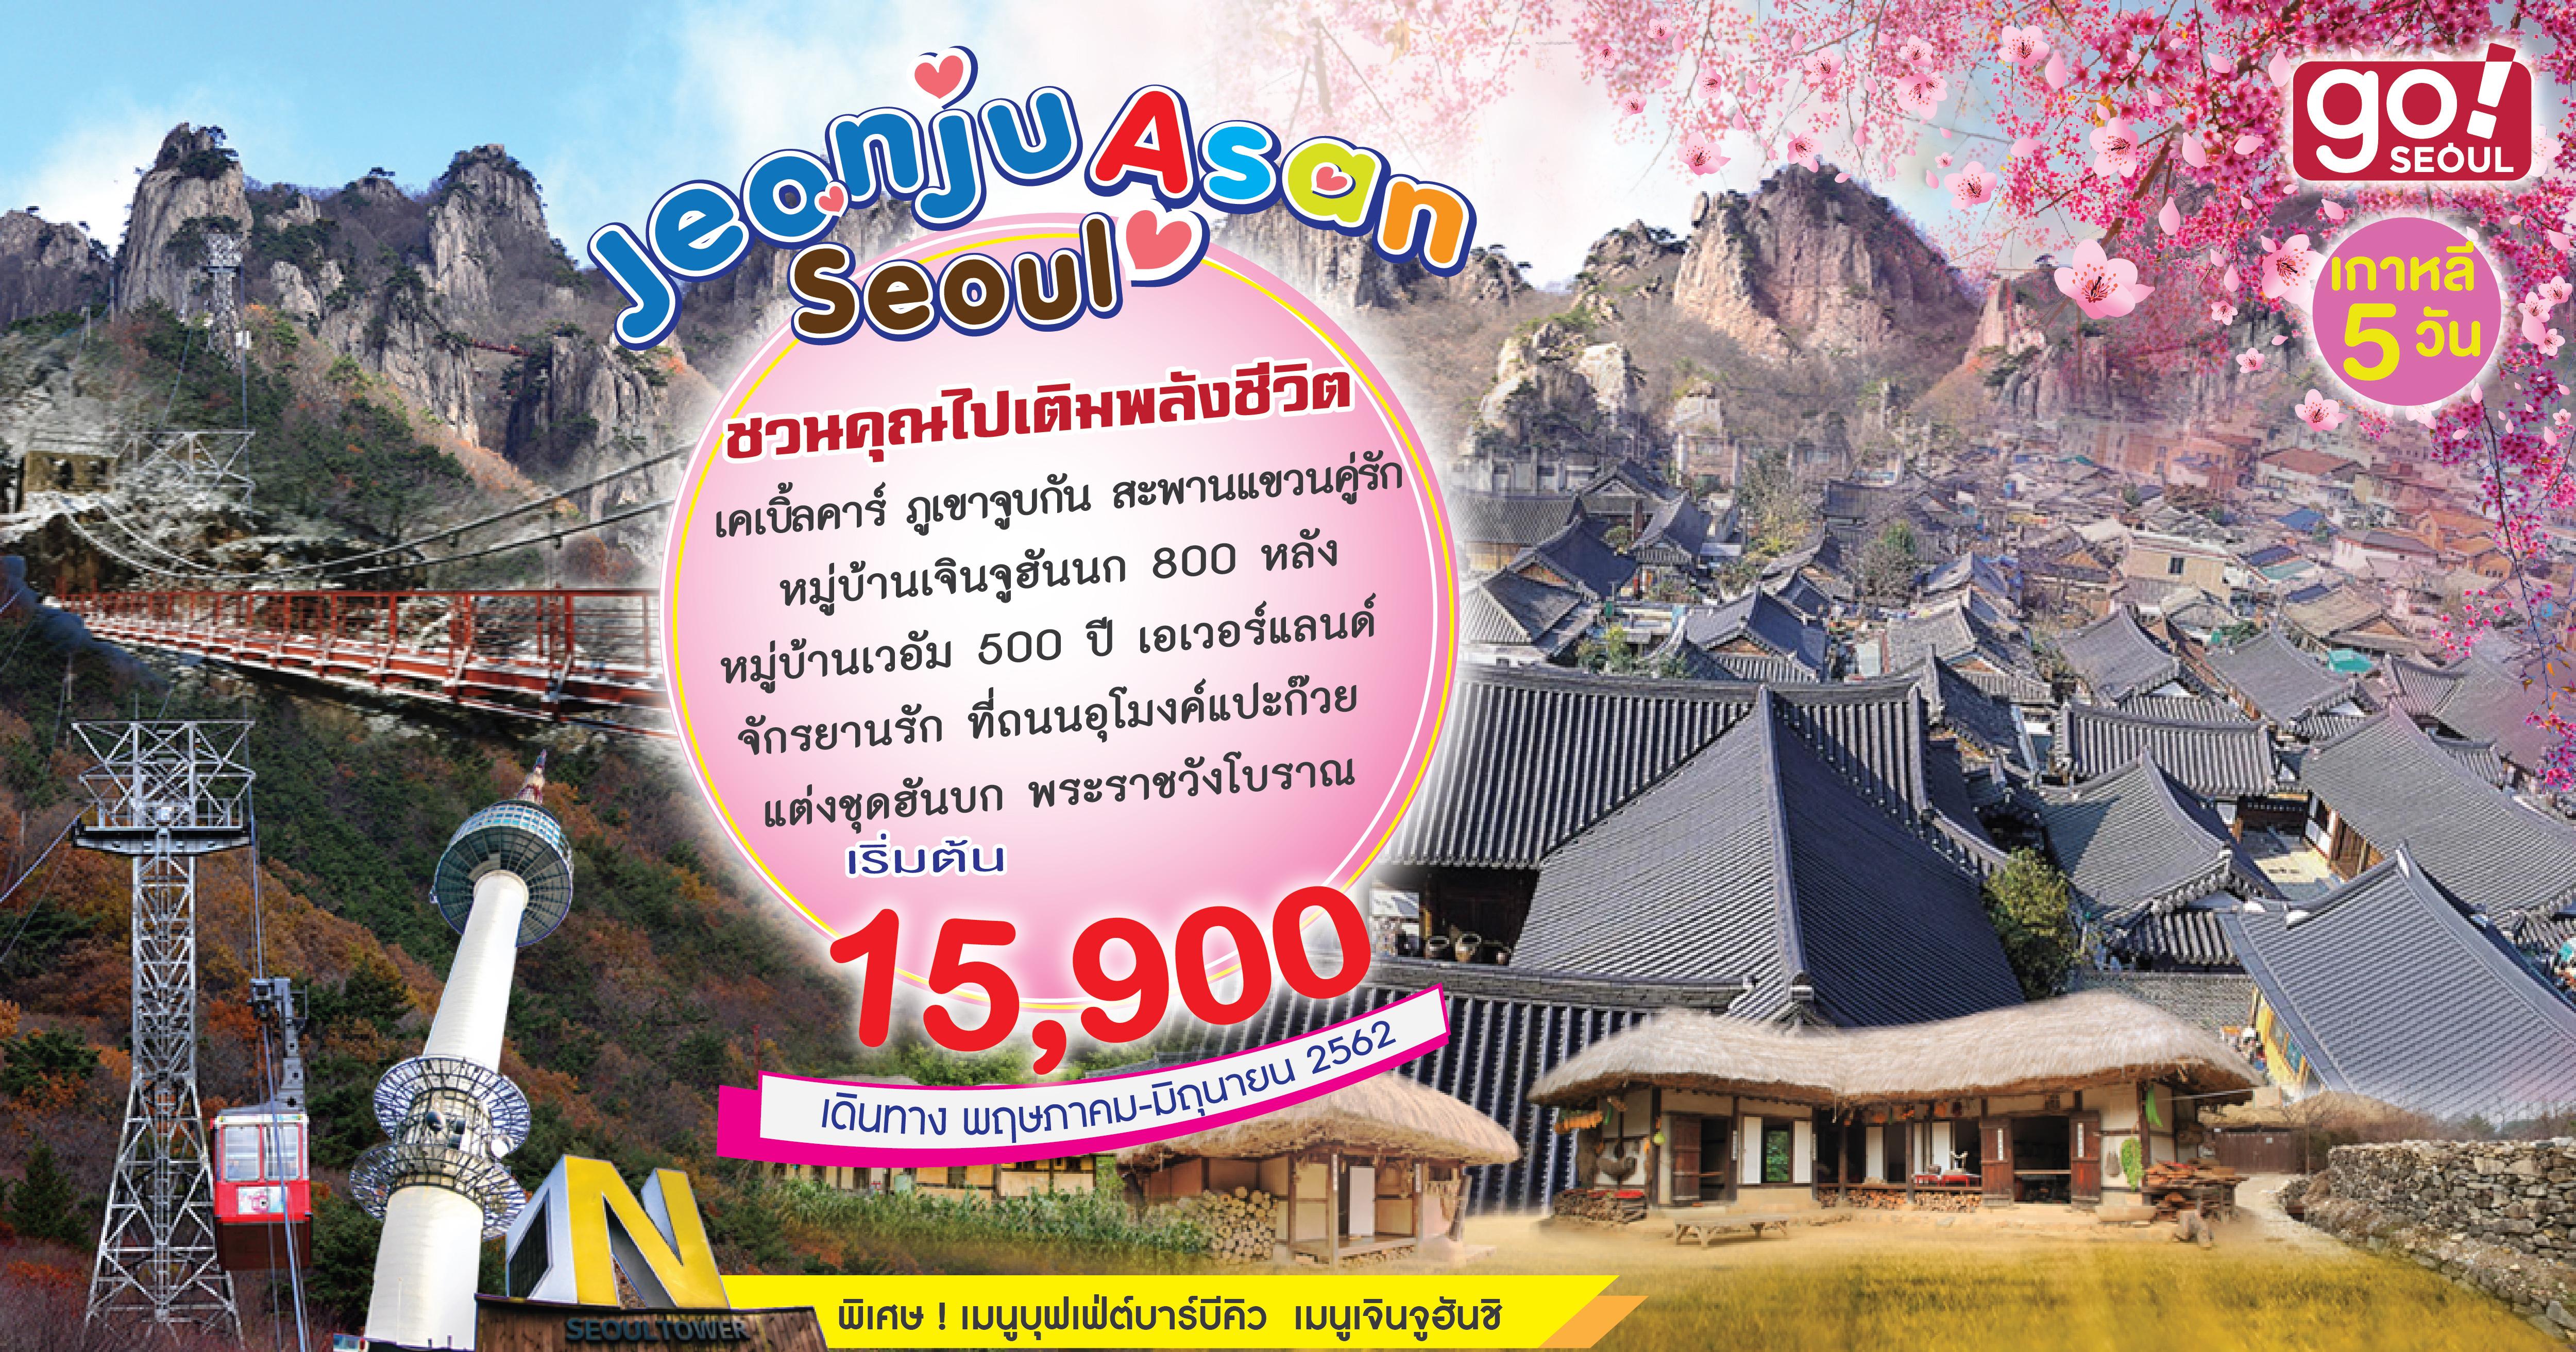 Jeonju_Asan_Seoul_15900_1200x630px_300dpi-01